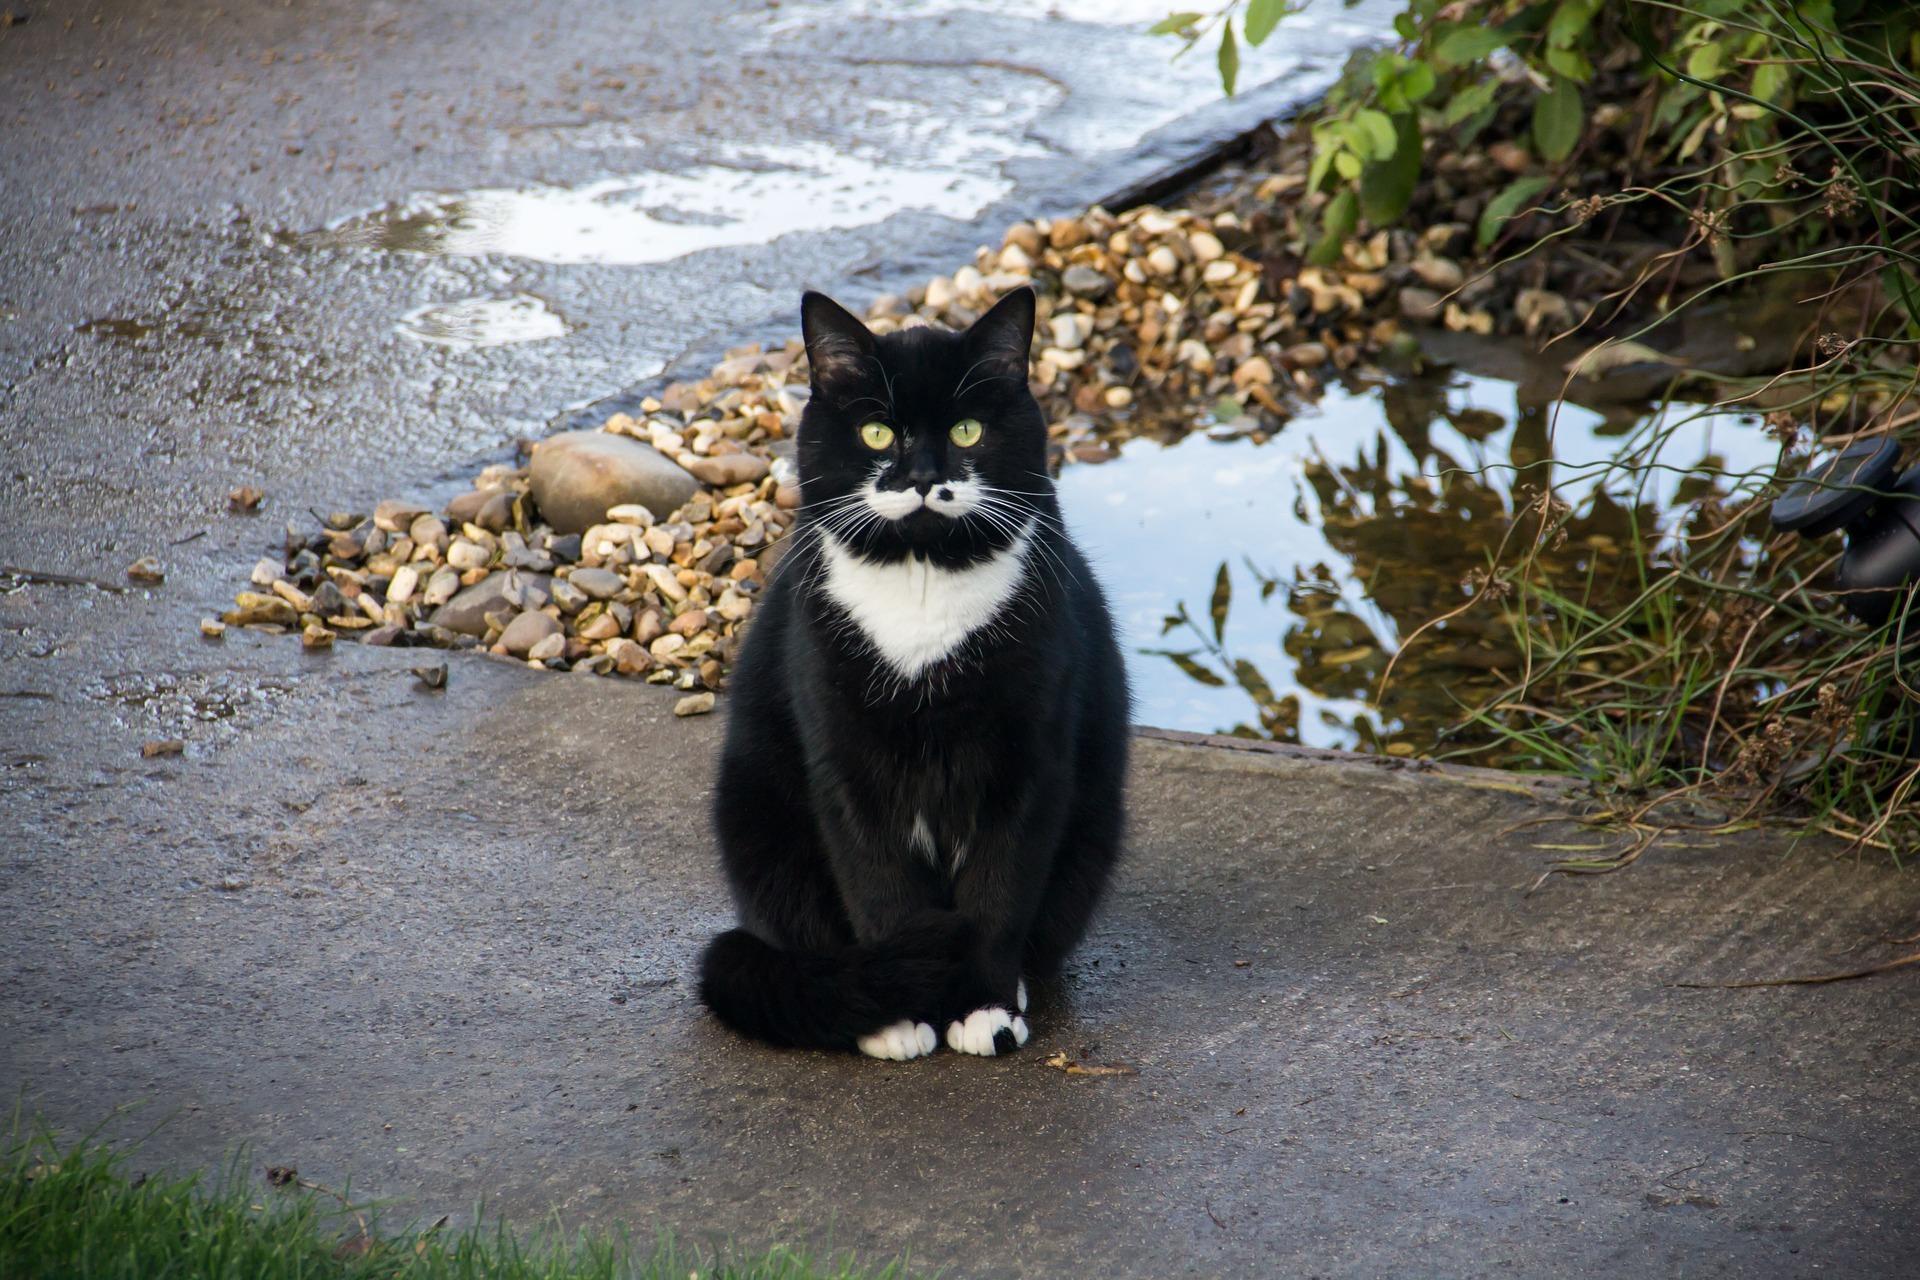 cat-2758528_1920.jpg